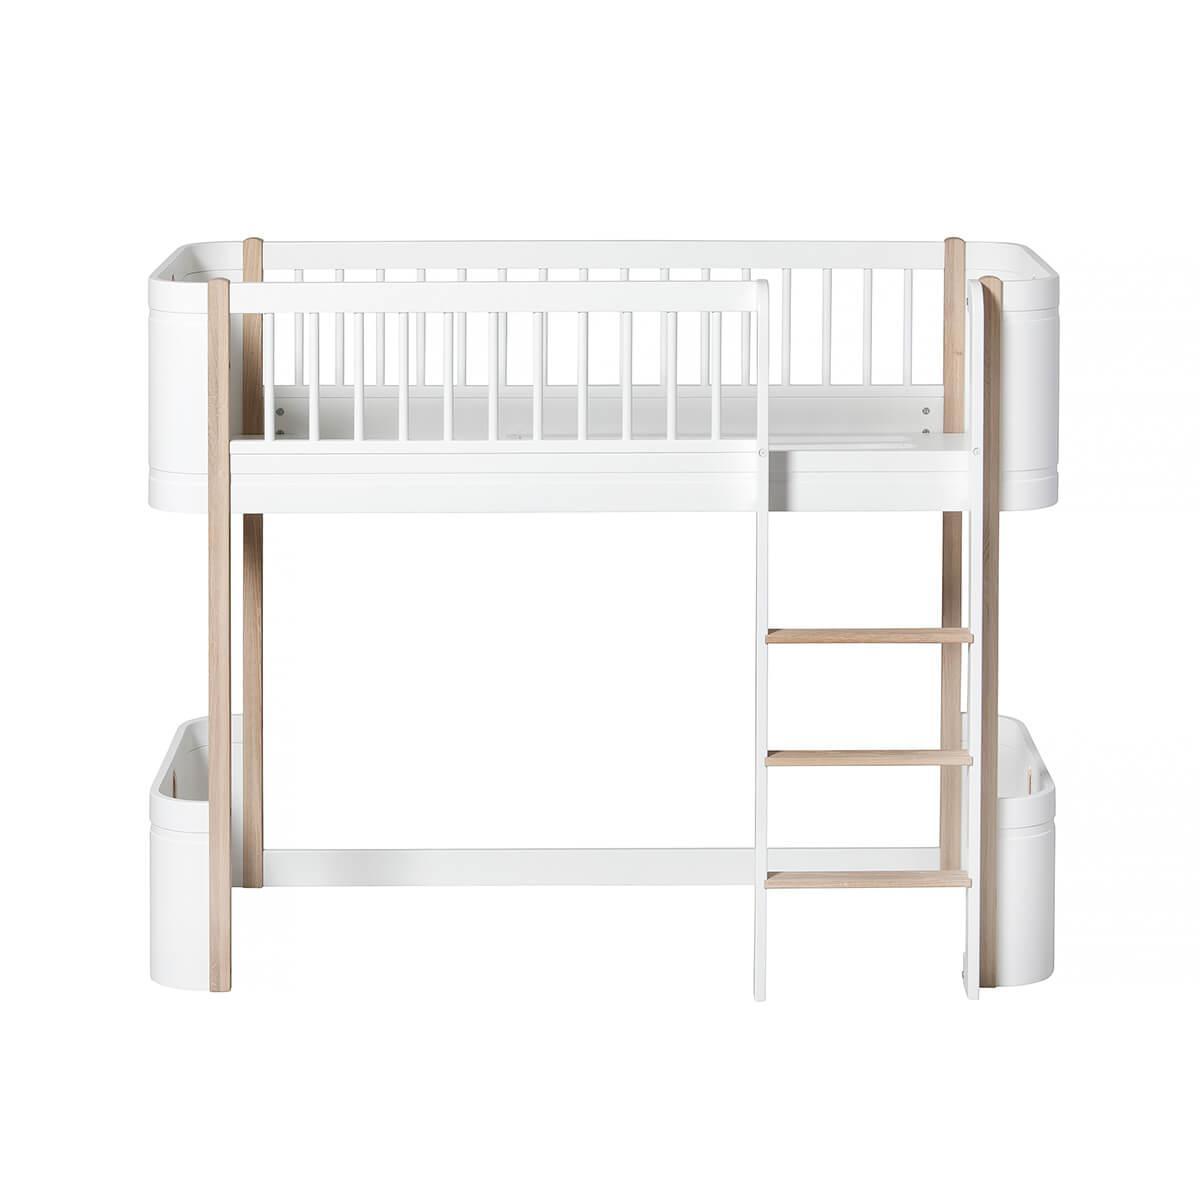 Cama evolutiva semi alta 68x162cm MINI+ WOOD Oliver Furniture blanco-roble